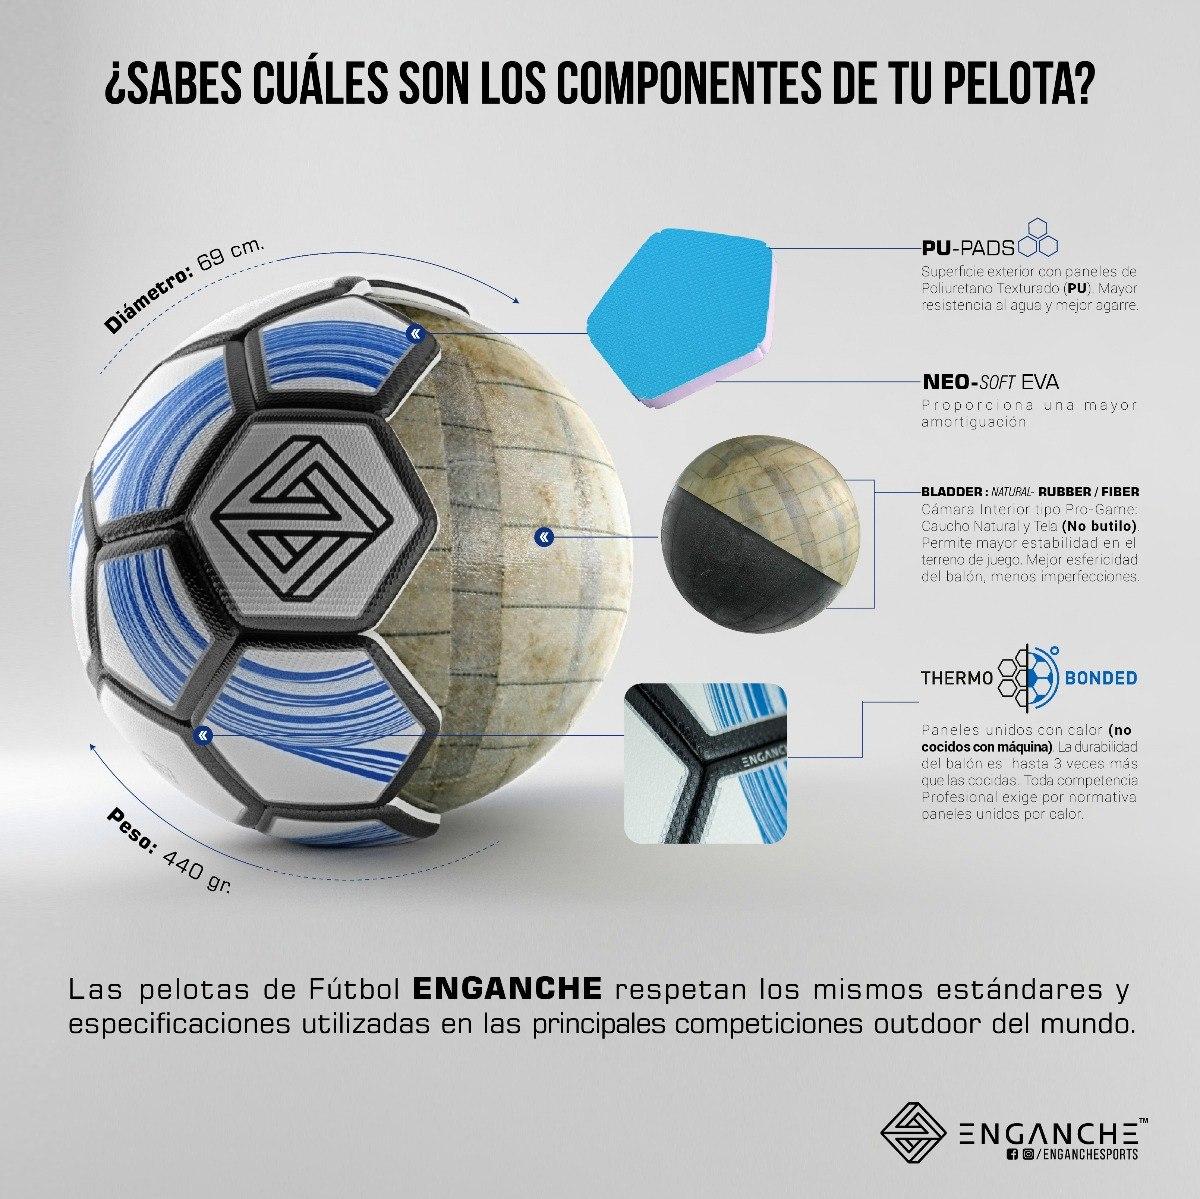 Pelota fútbol enganche numero cinco profesional cargando zoom jpg 1200x1199  Futbol peso pelotas de futball 45d2221249b38